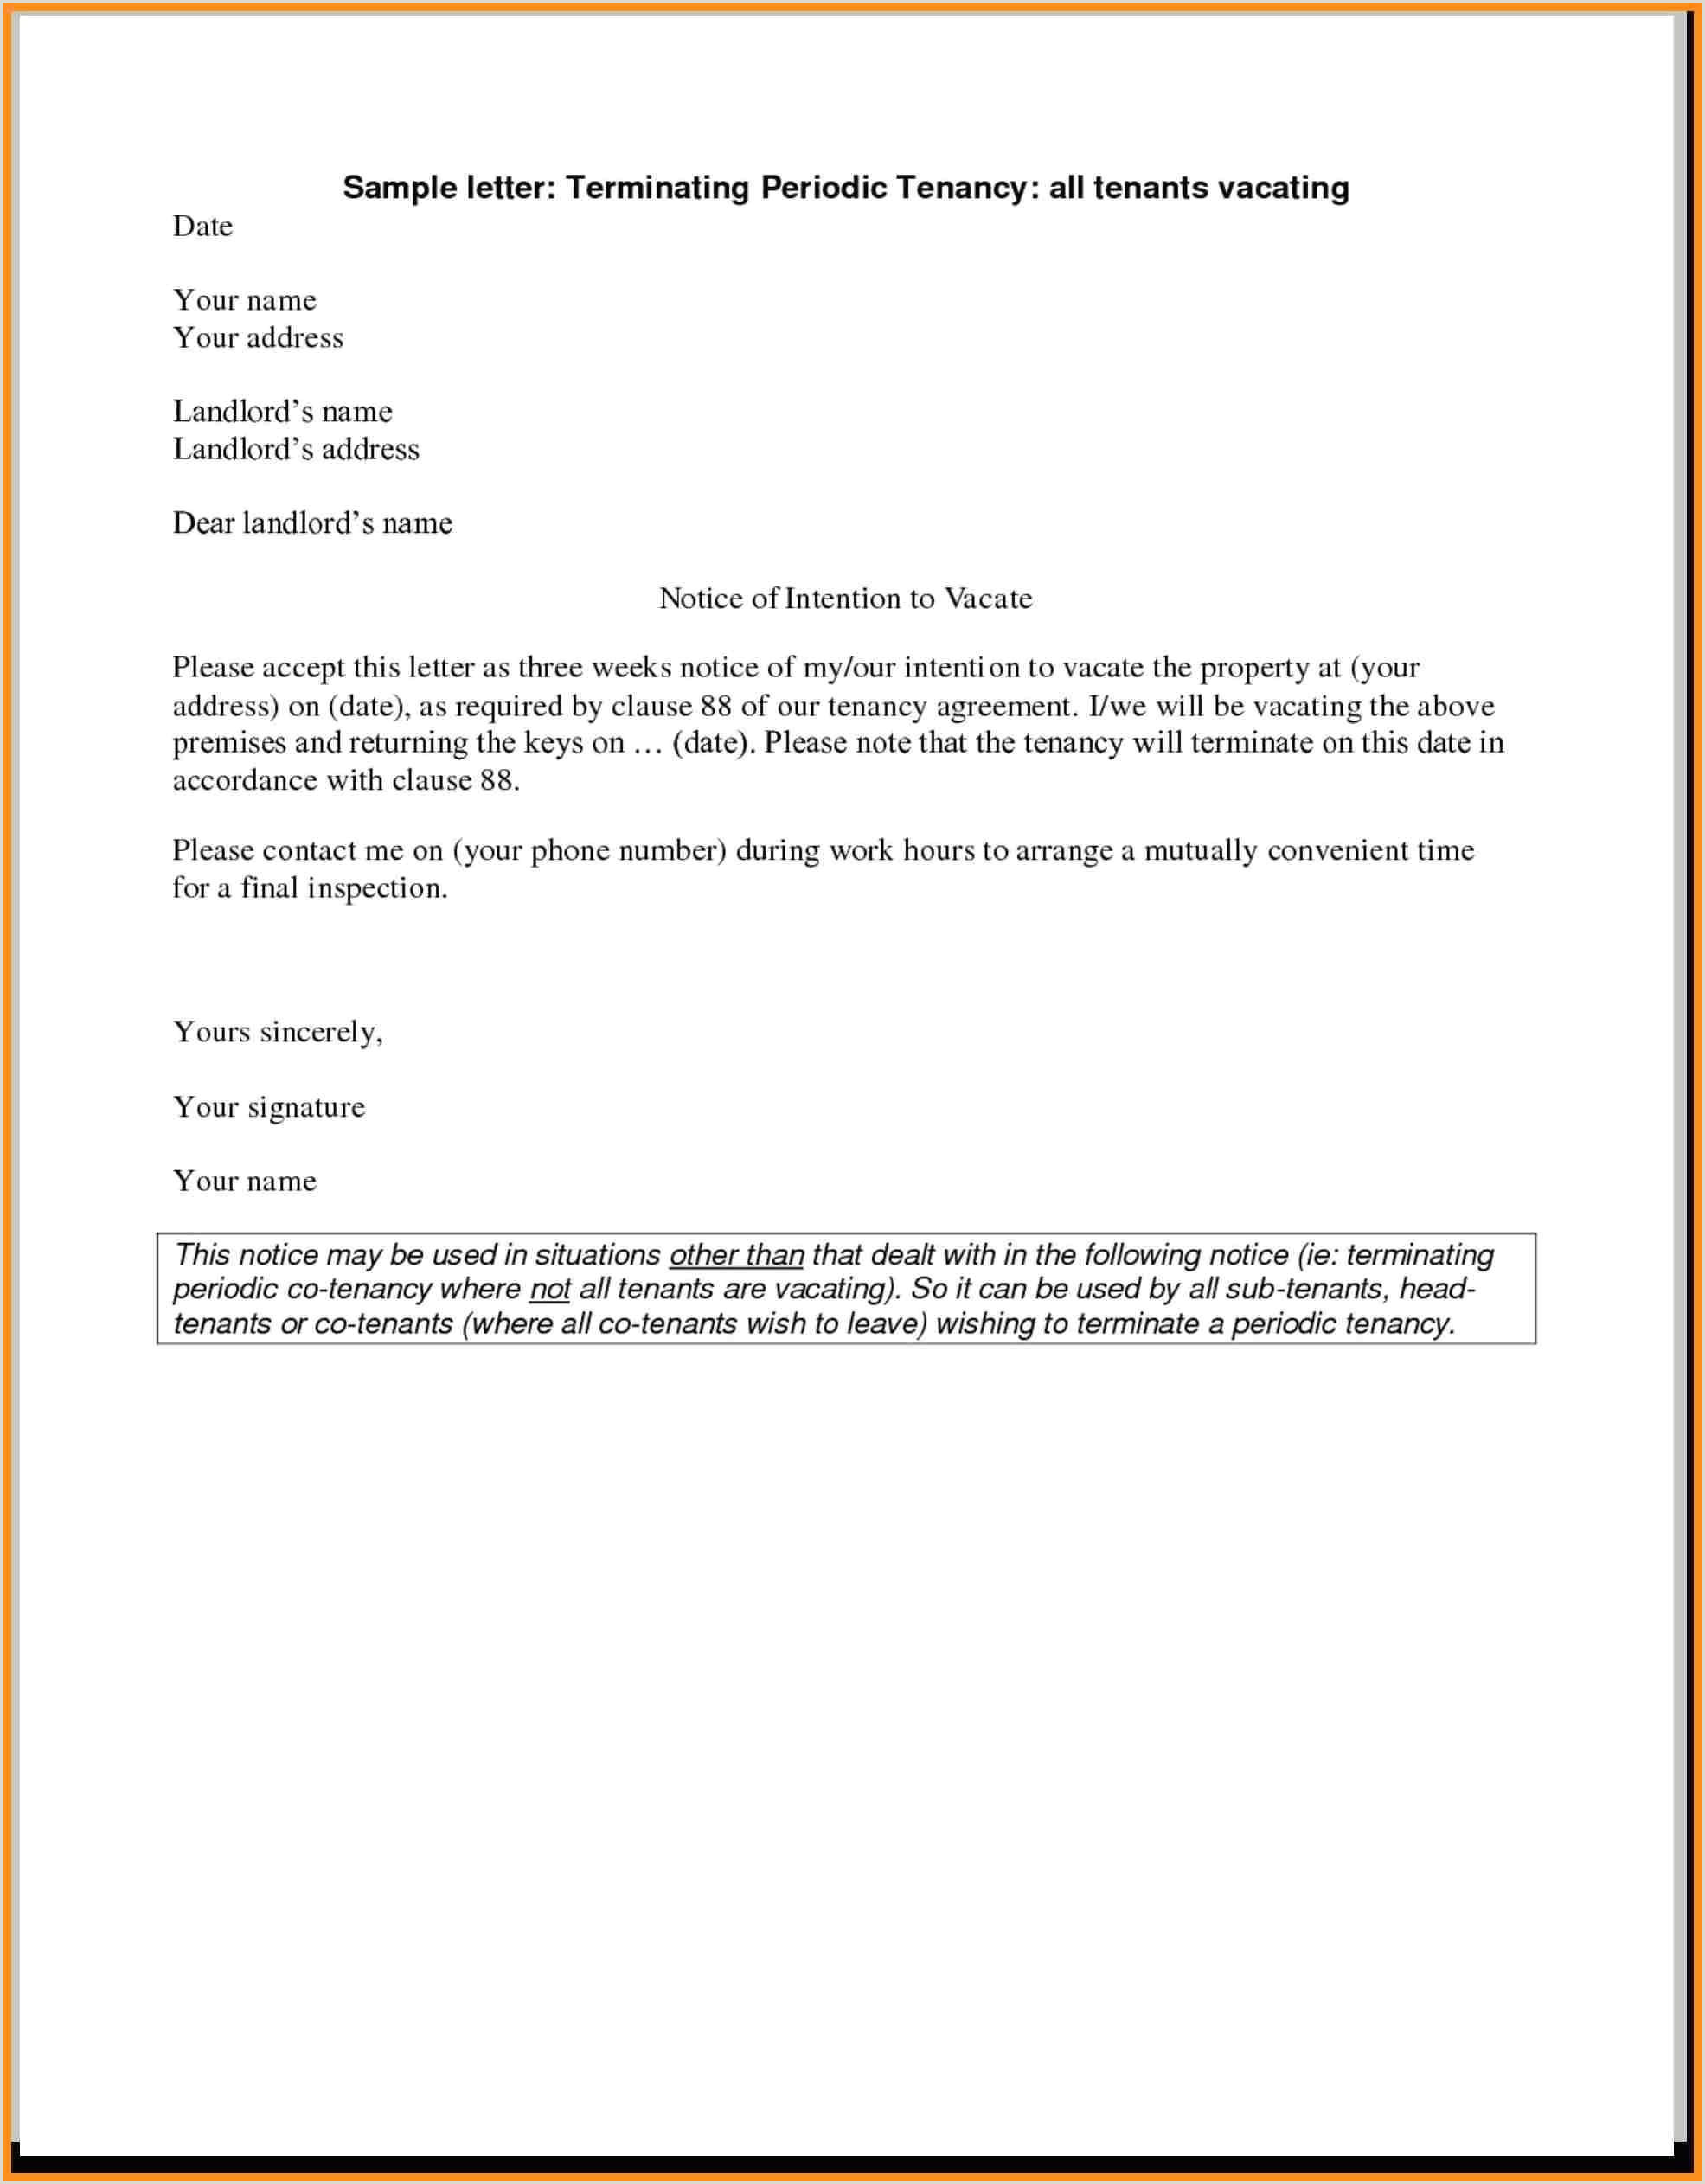 Pharmacist Resume Examples Pharmacy Resume Example Professional Obama Infographic